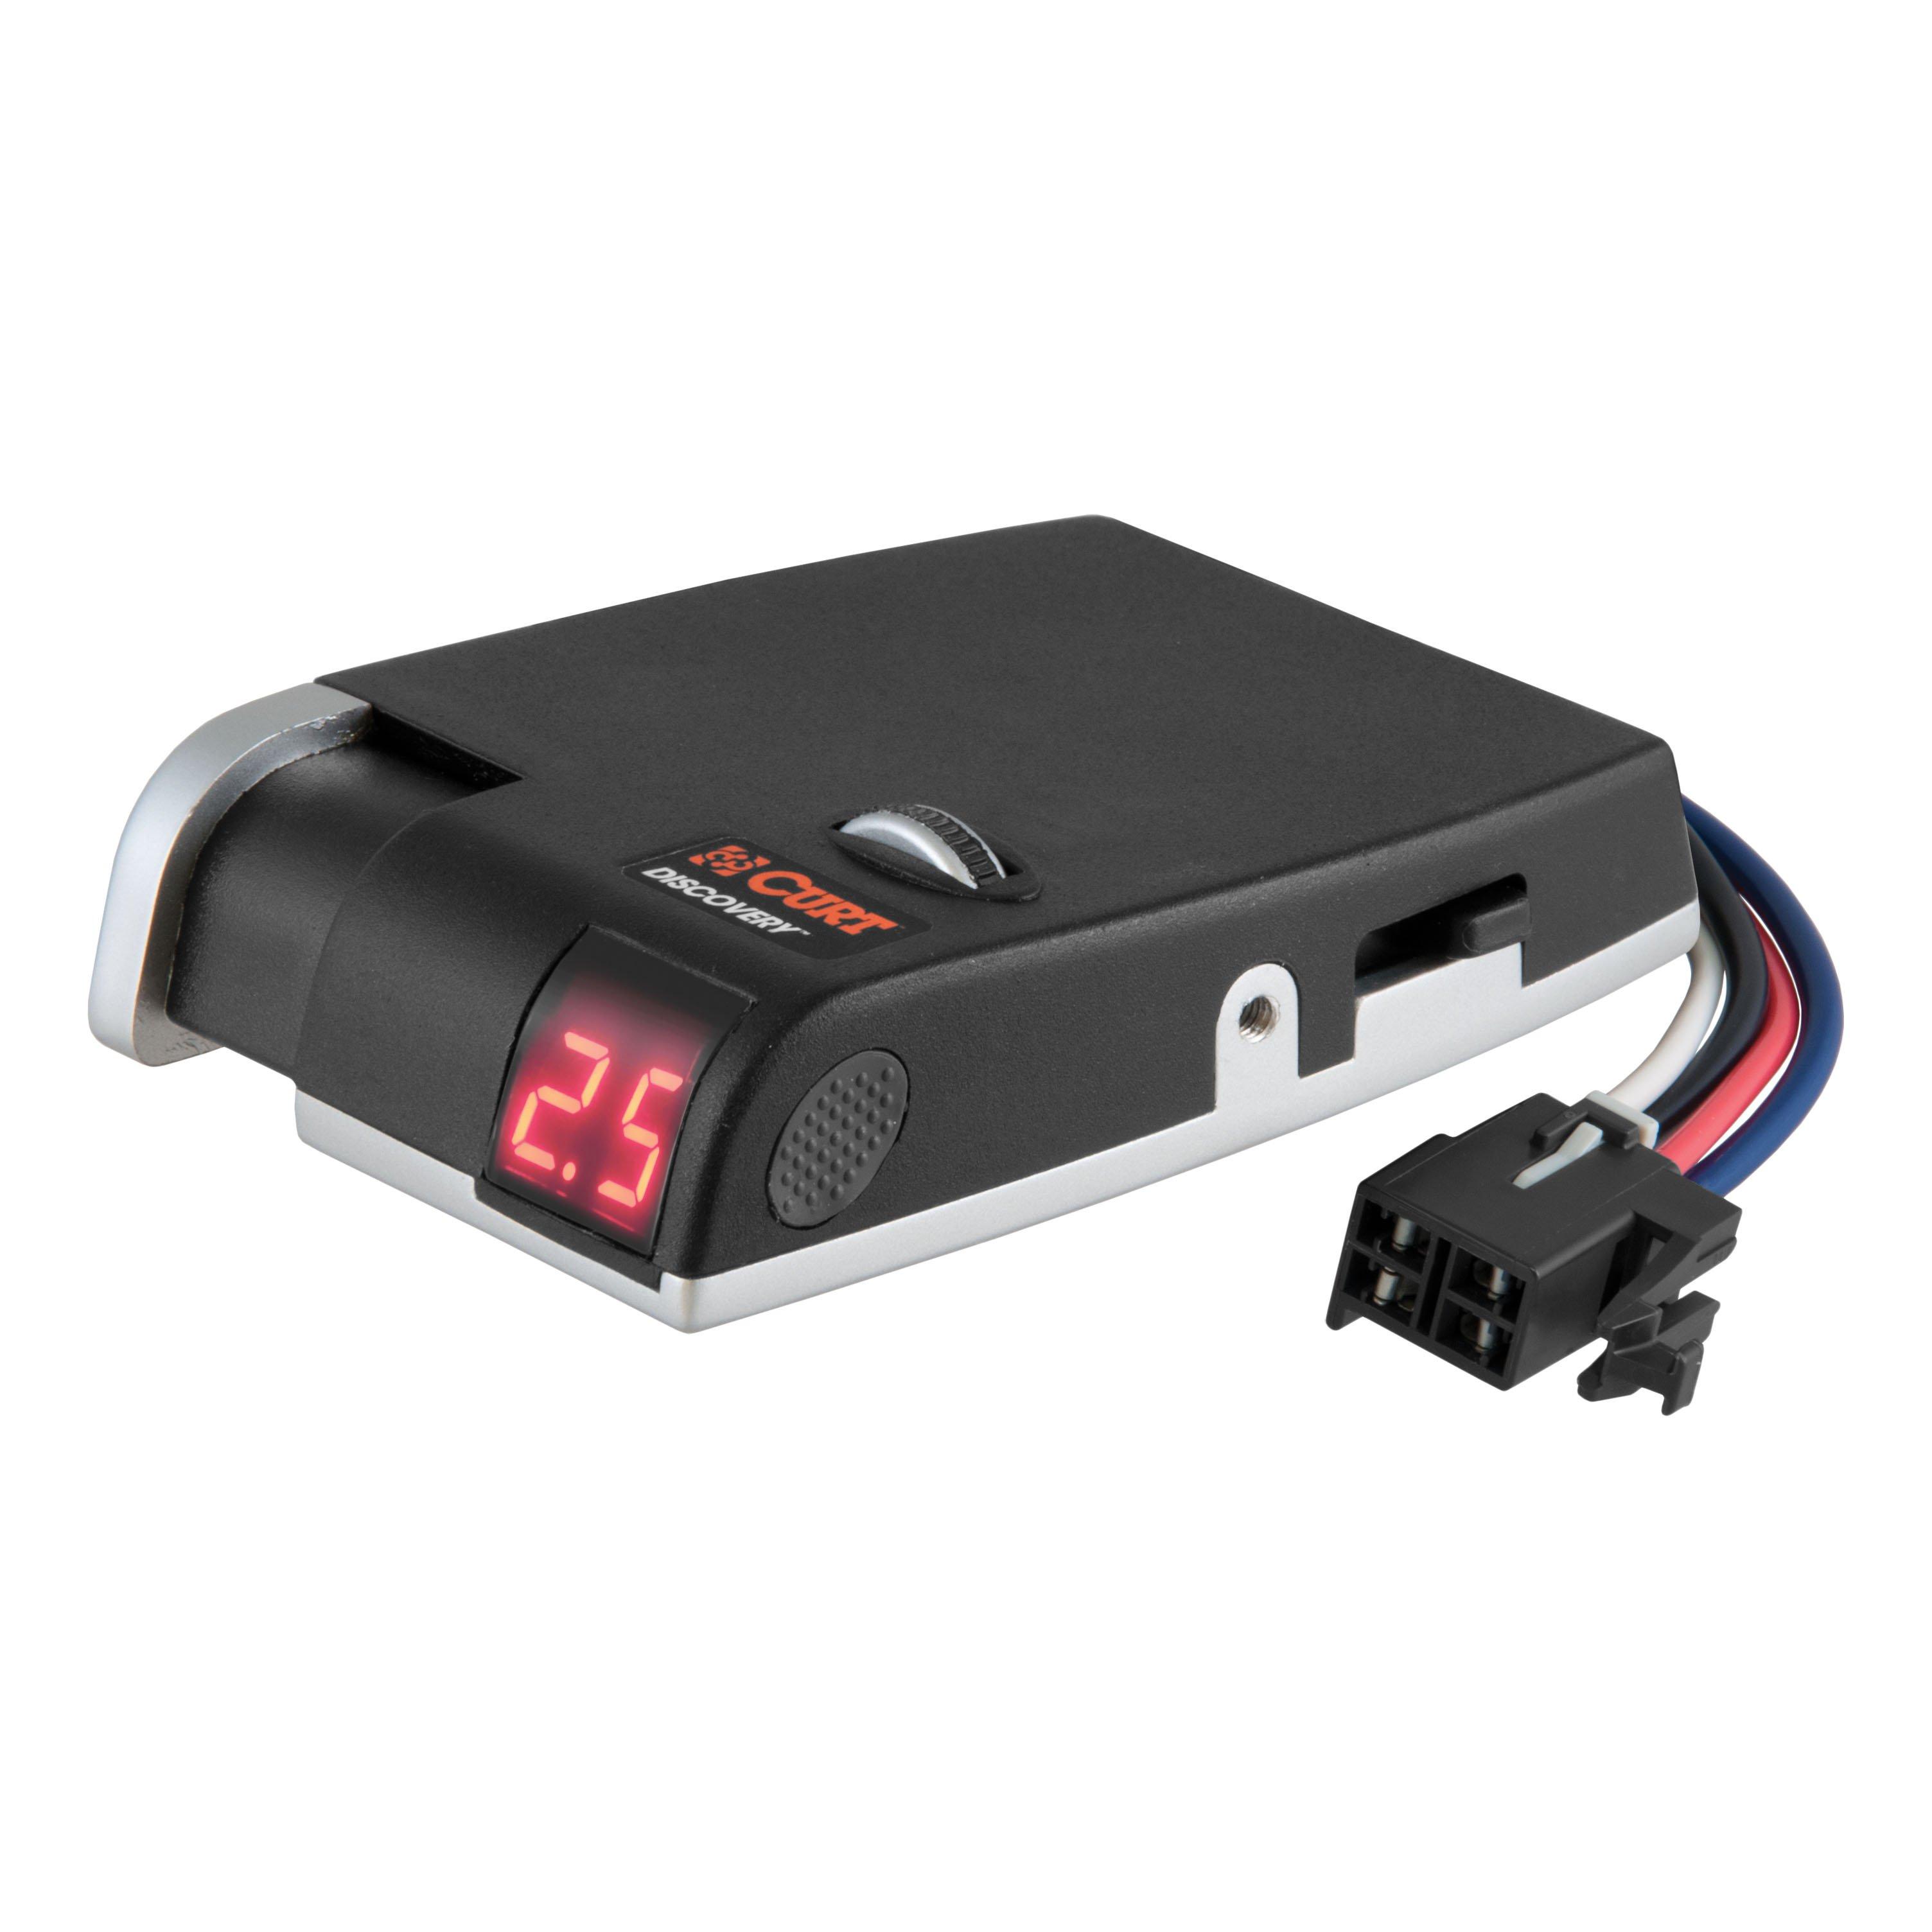 curt discovery brake controller & wiring kit for toyota ... hopkins impulse trailer brake controller wiring diagram toyota tacoma brake controller wiring